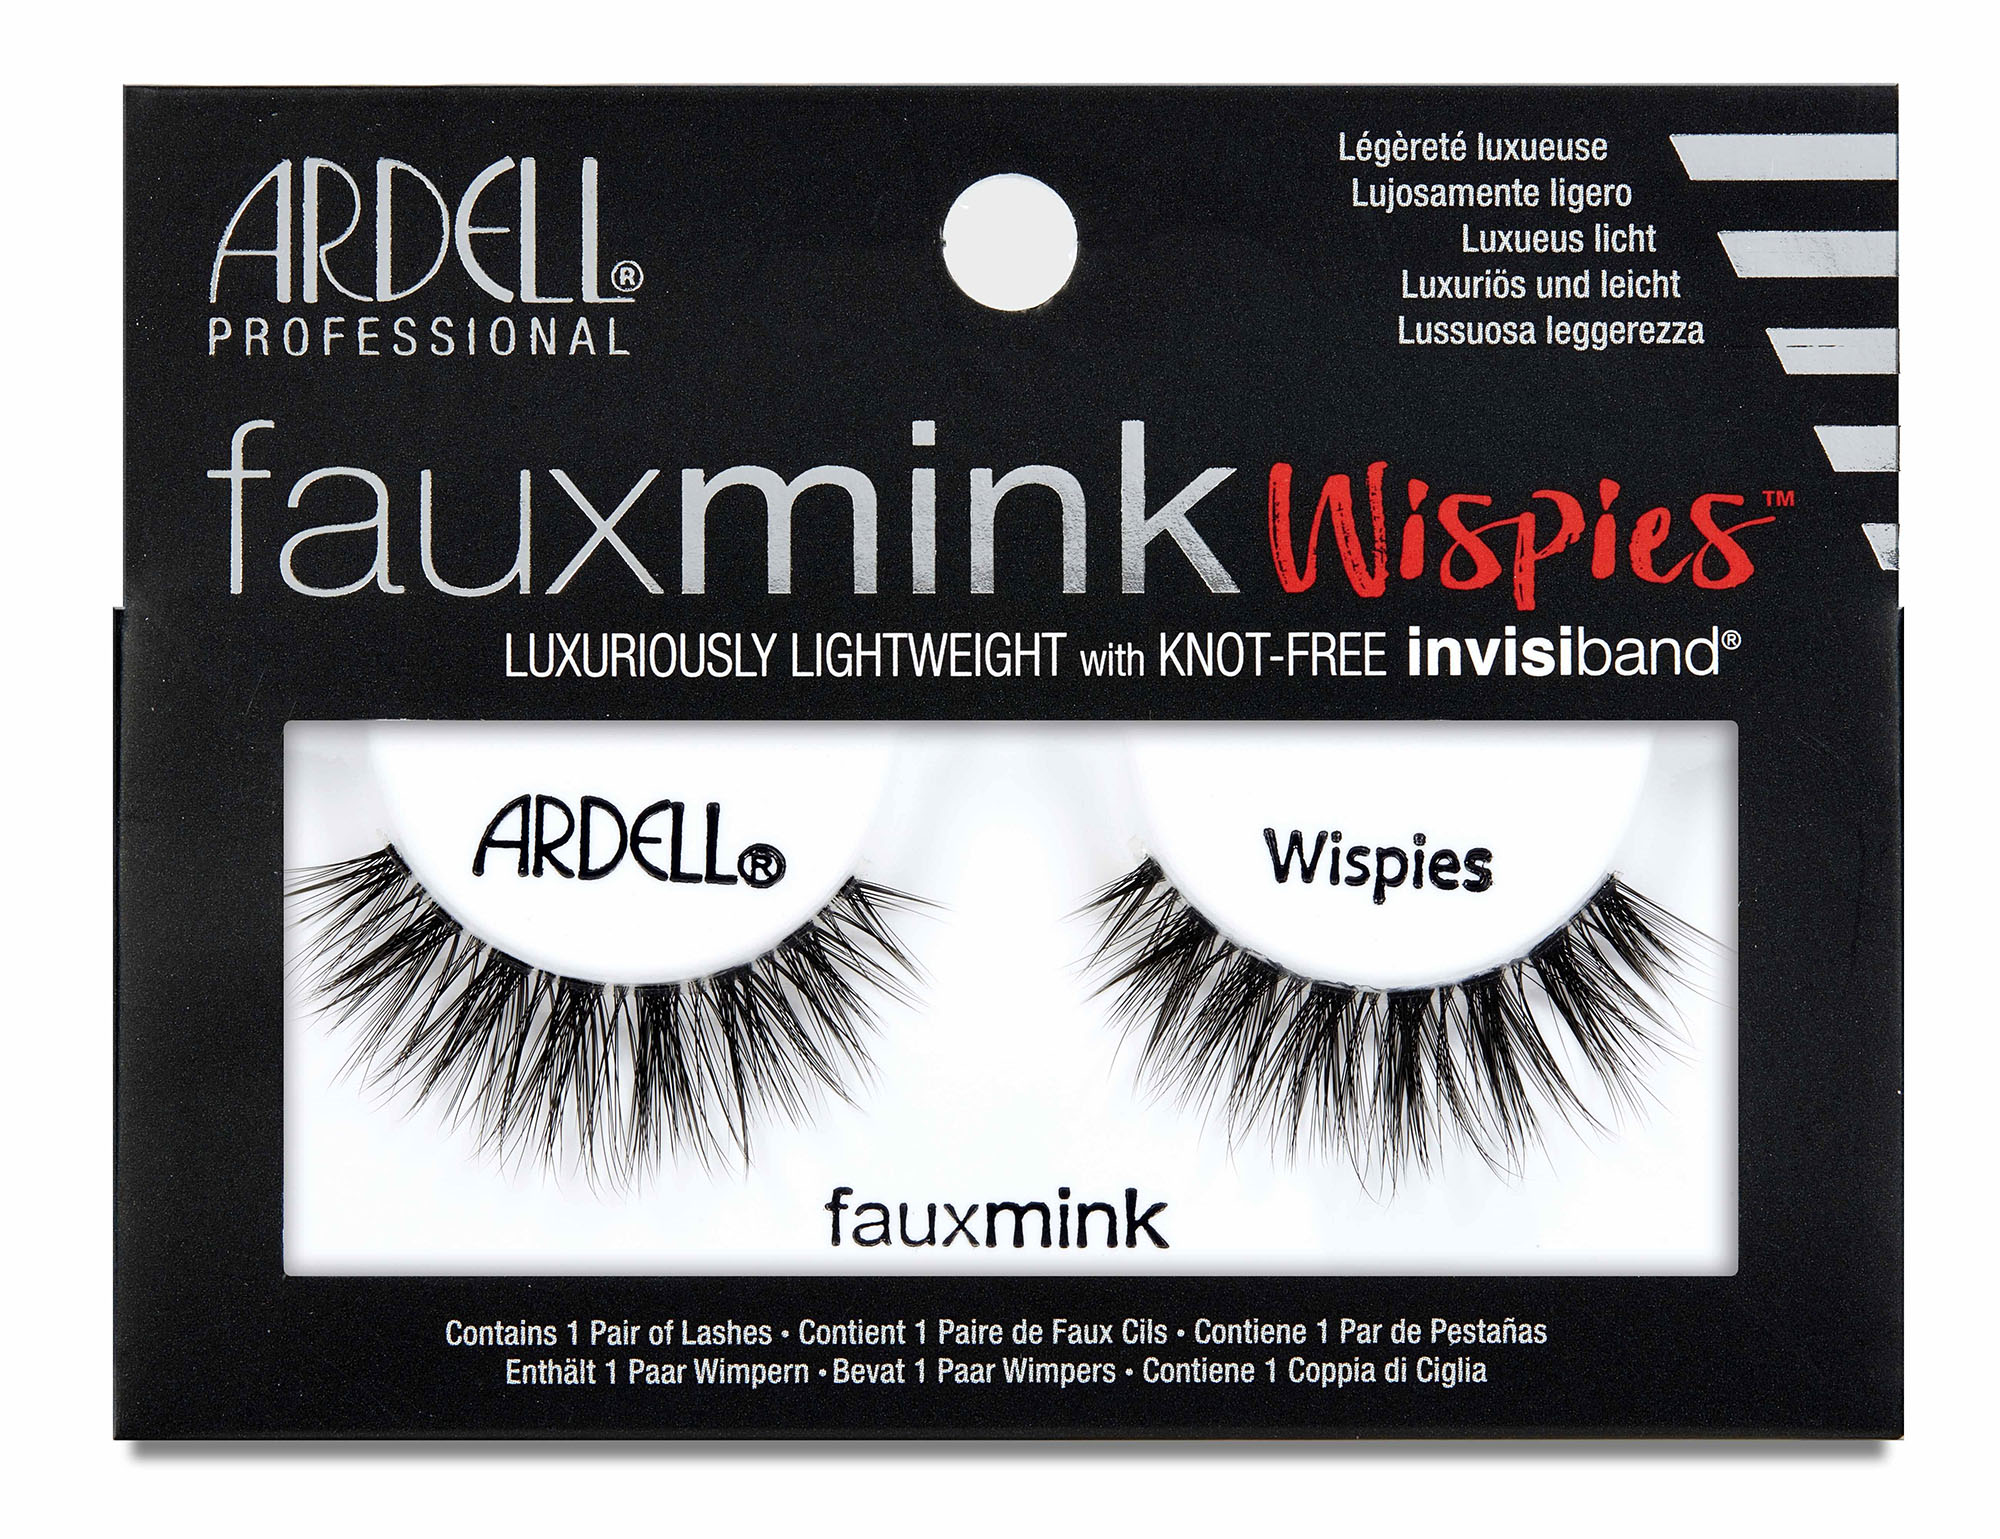 Faux Mink Wispies False Lashes